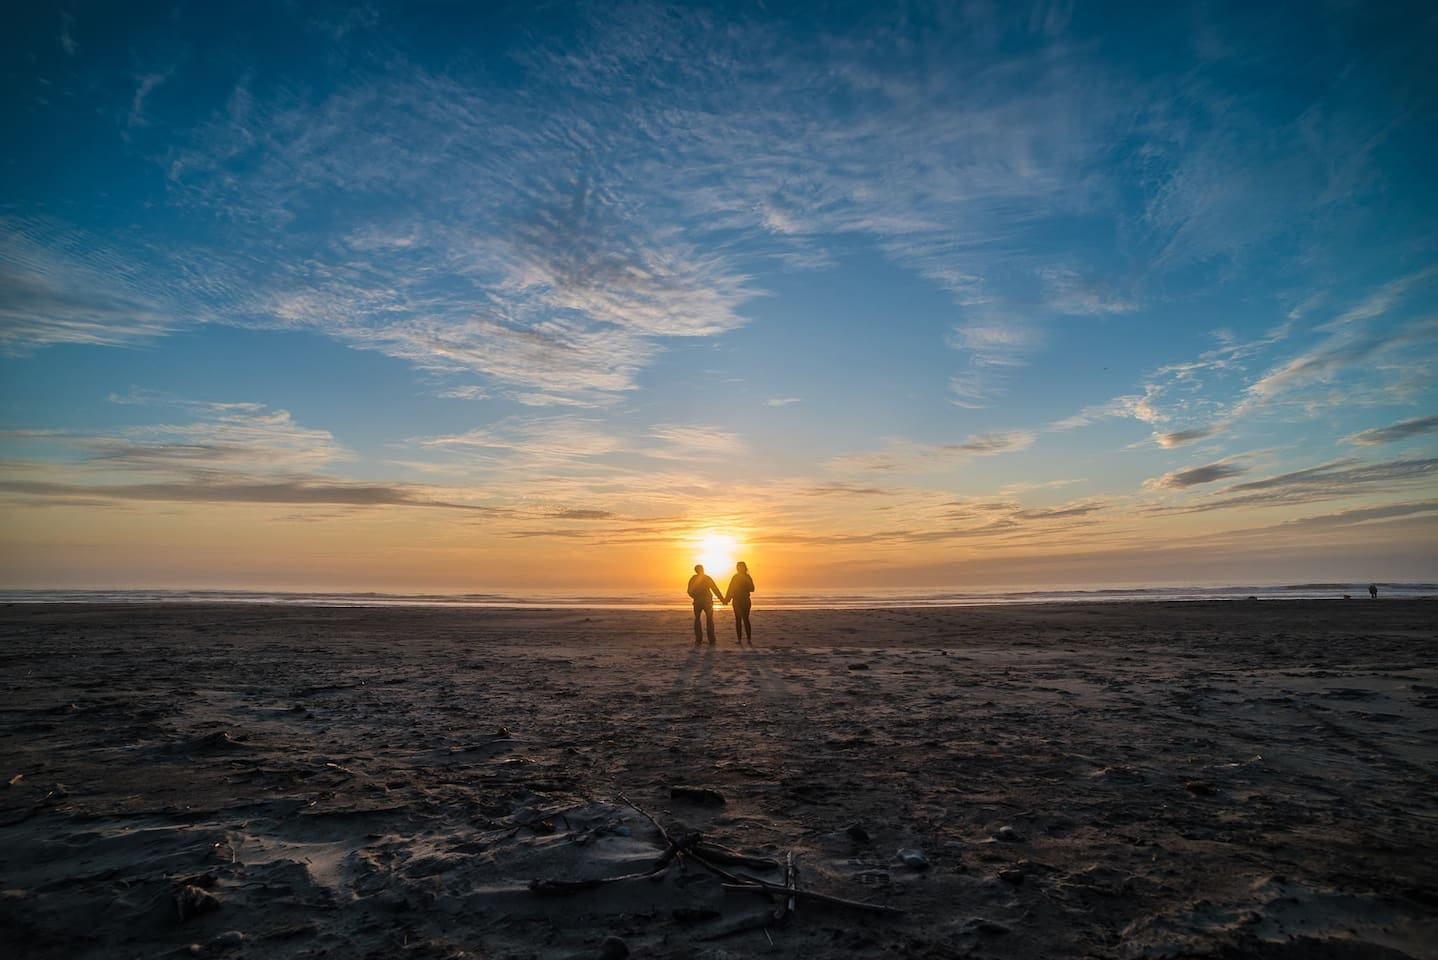 Holiday Beach at sunset